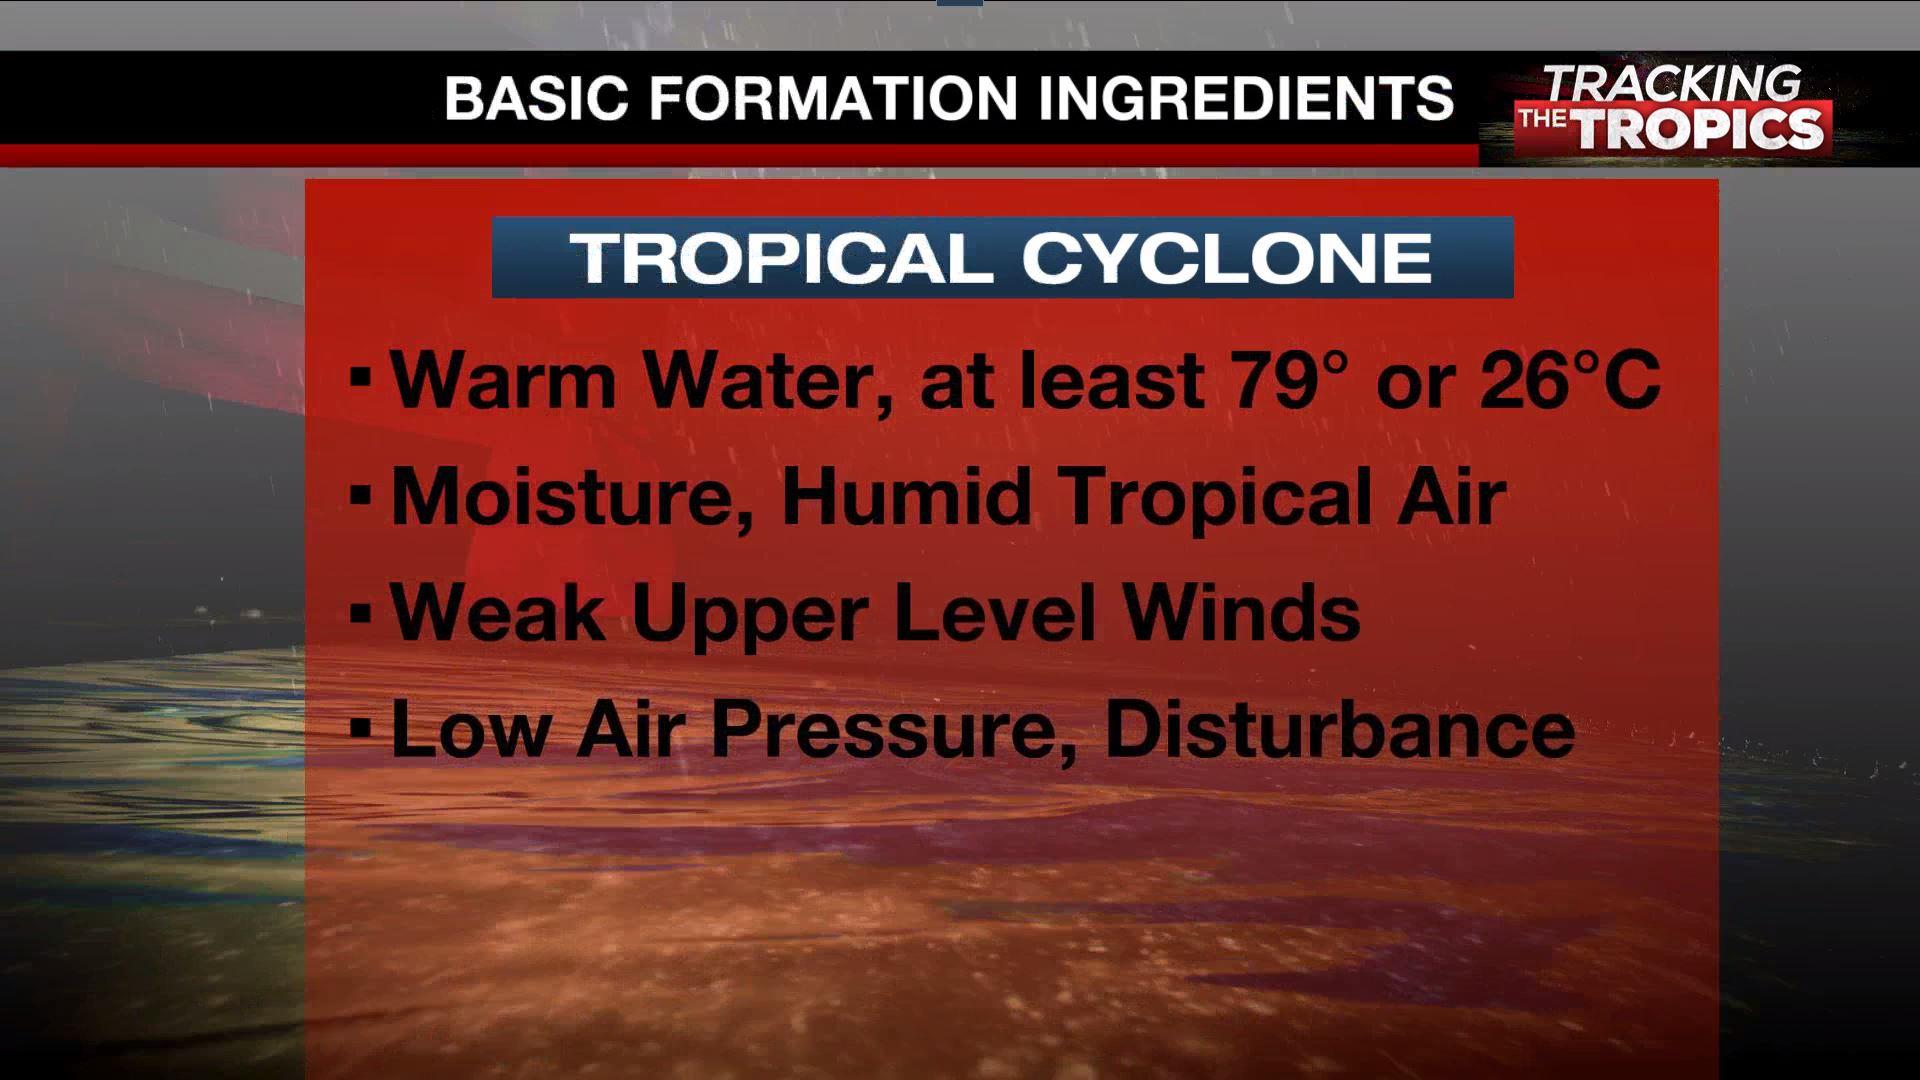 Tracking the Tropics: How do hurricanes form?